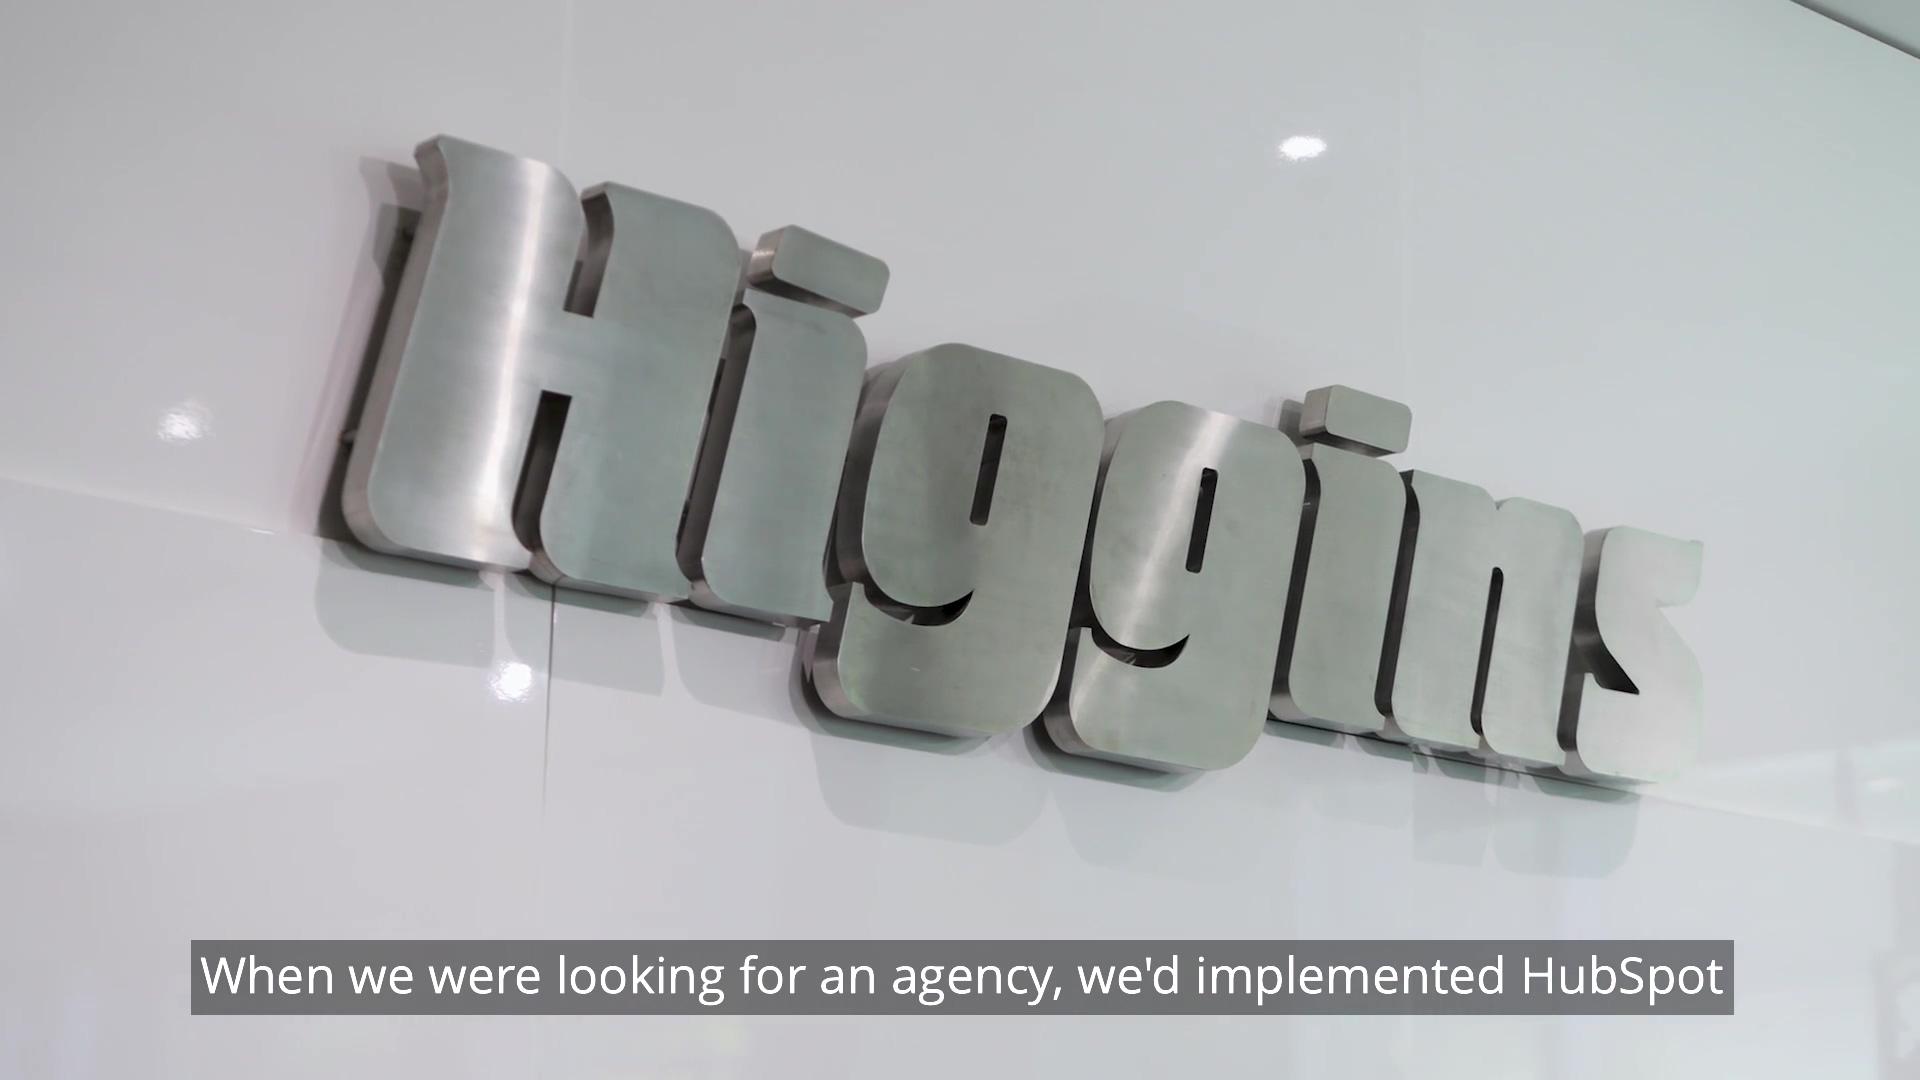 Brand-chemistry-Higgins-Coatings-Case-Study